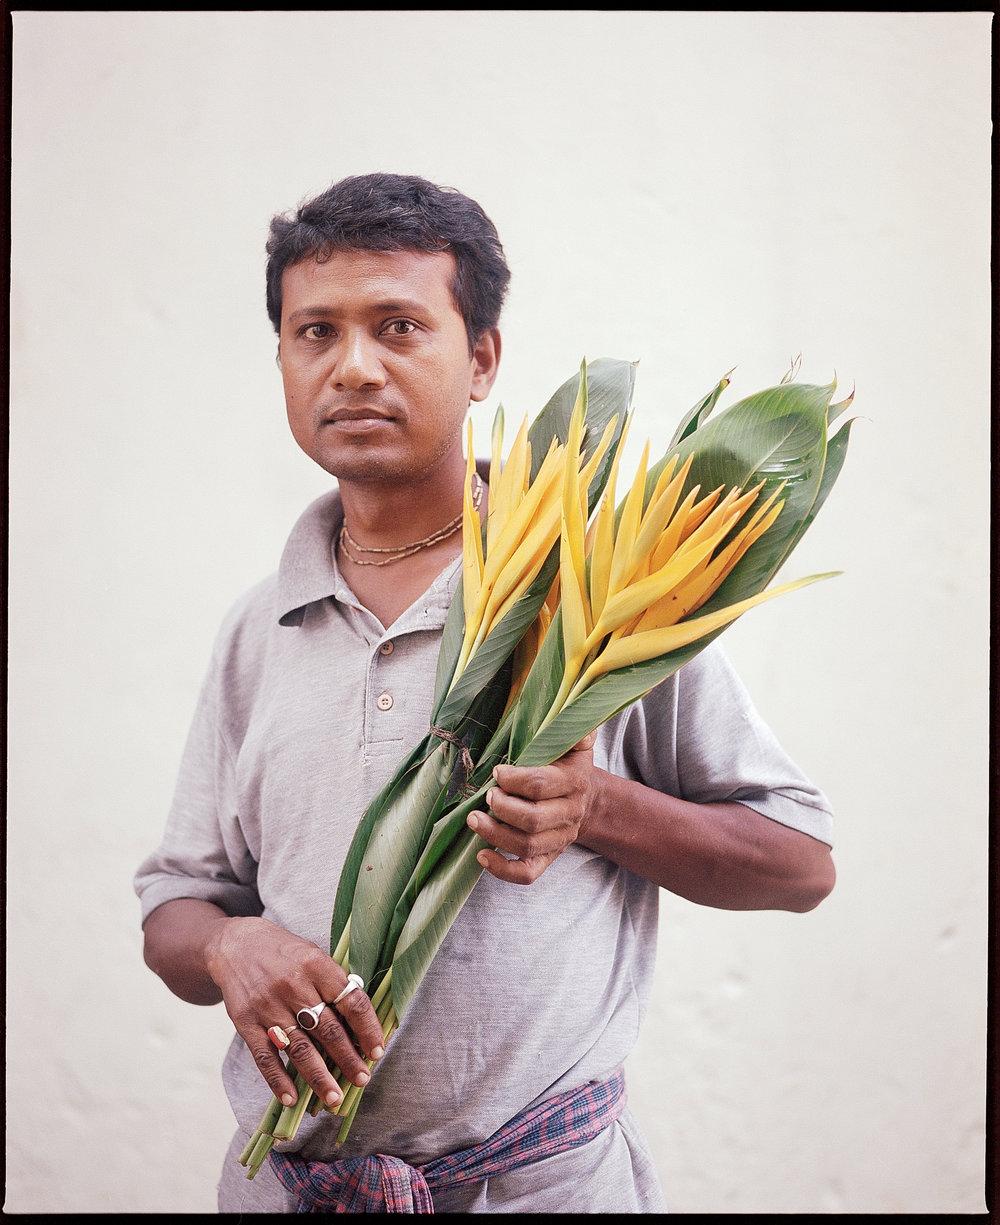 Kolkata_Flowers-33.jpg